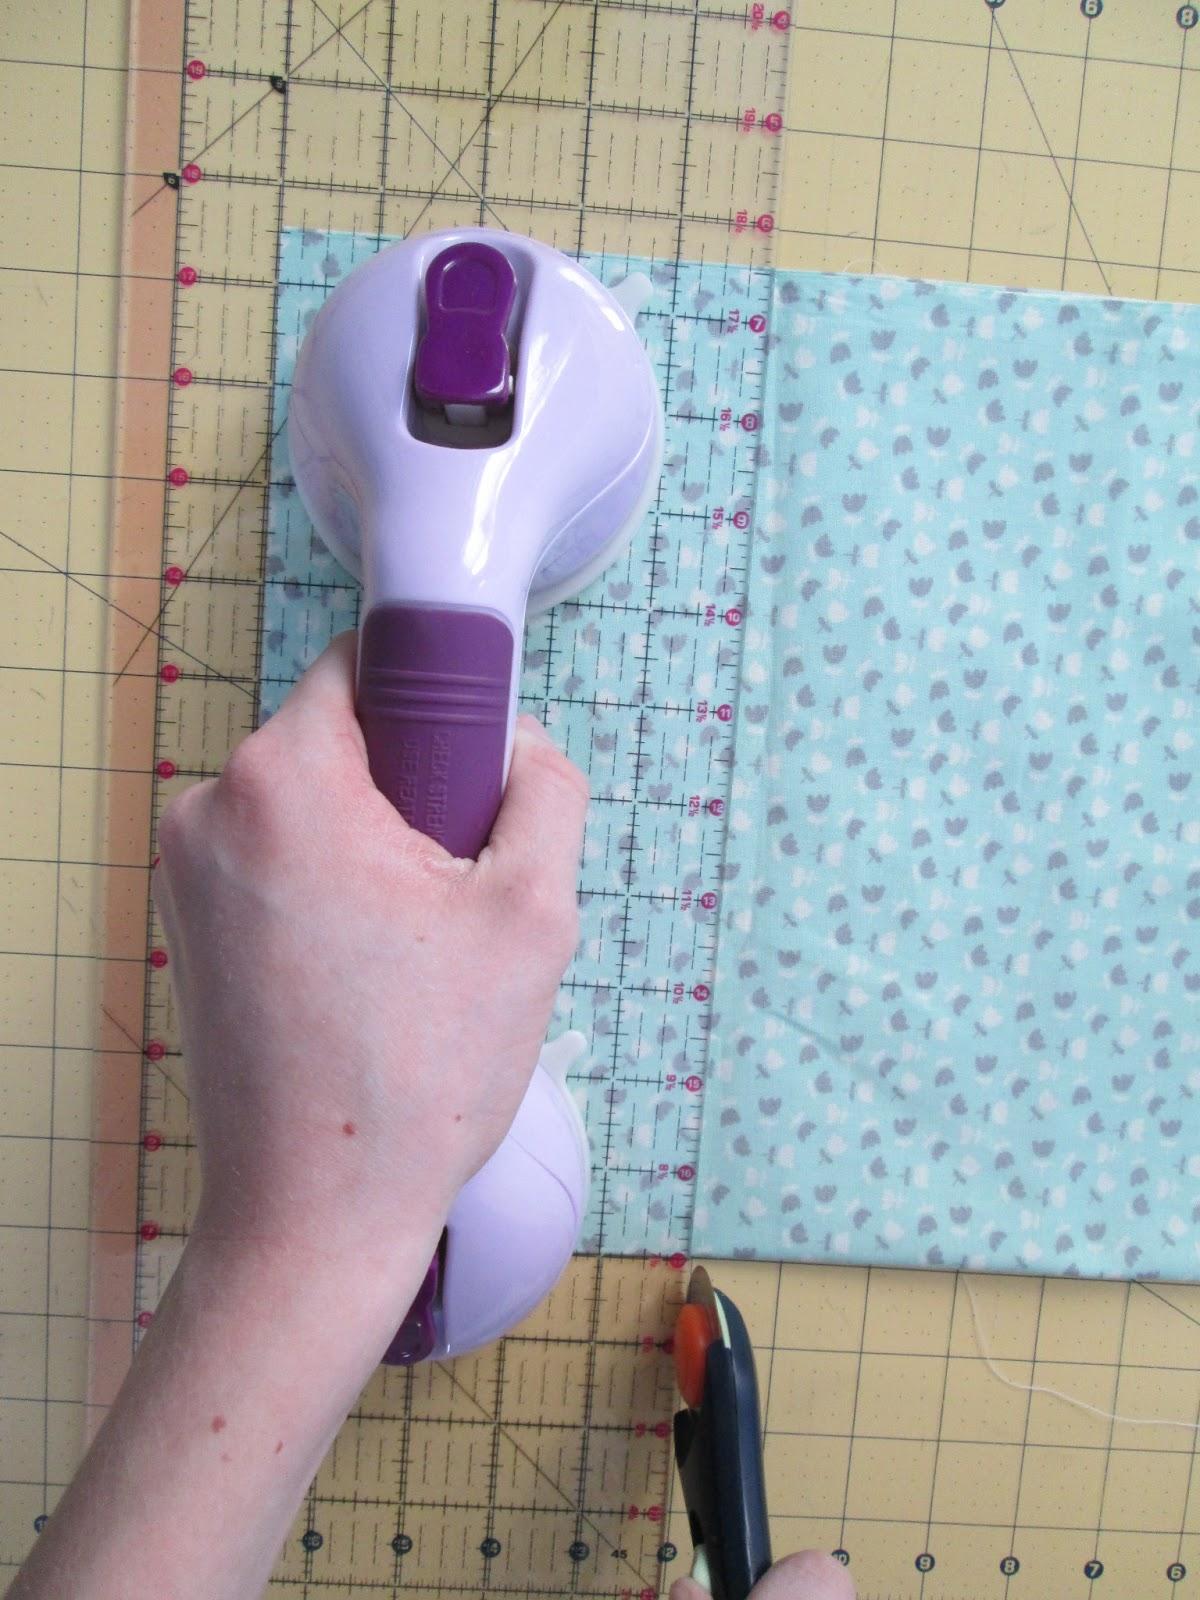 Fabric strip cutter rotary hand